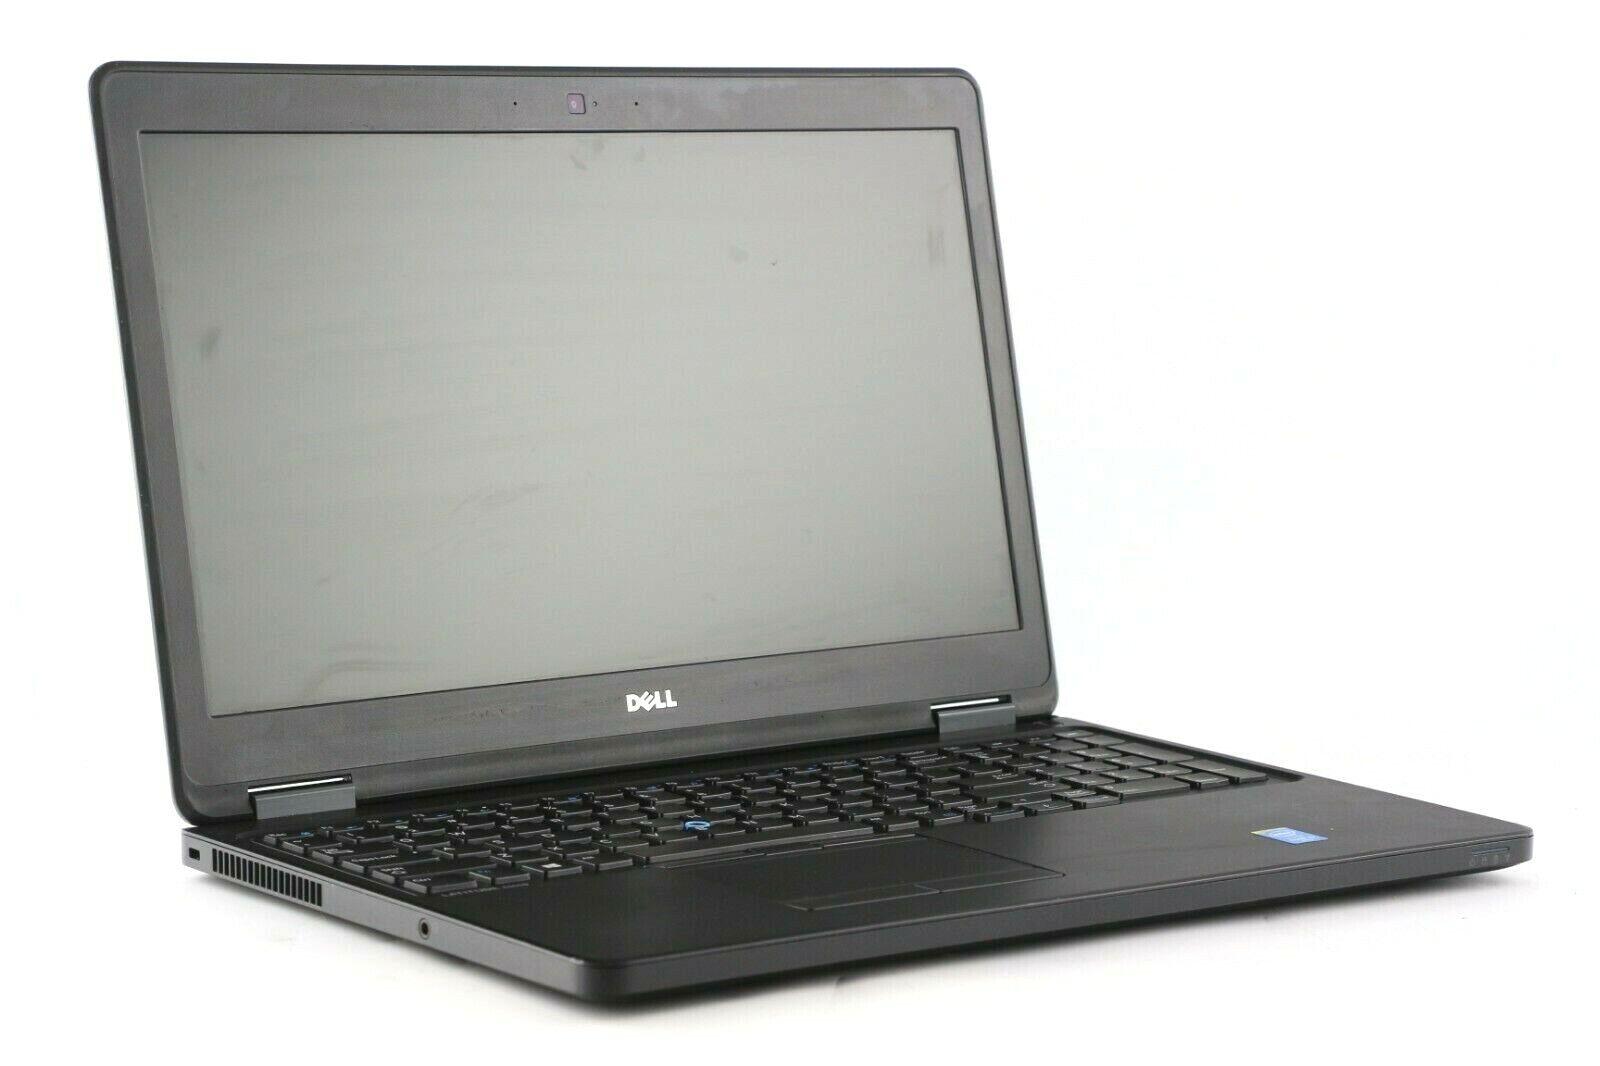 "Dell Latitude E5550 15.6"" i5-5300U 2.30GHz 128GB SSD 8GB RAM Windows 8.1 (BH)"